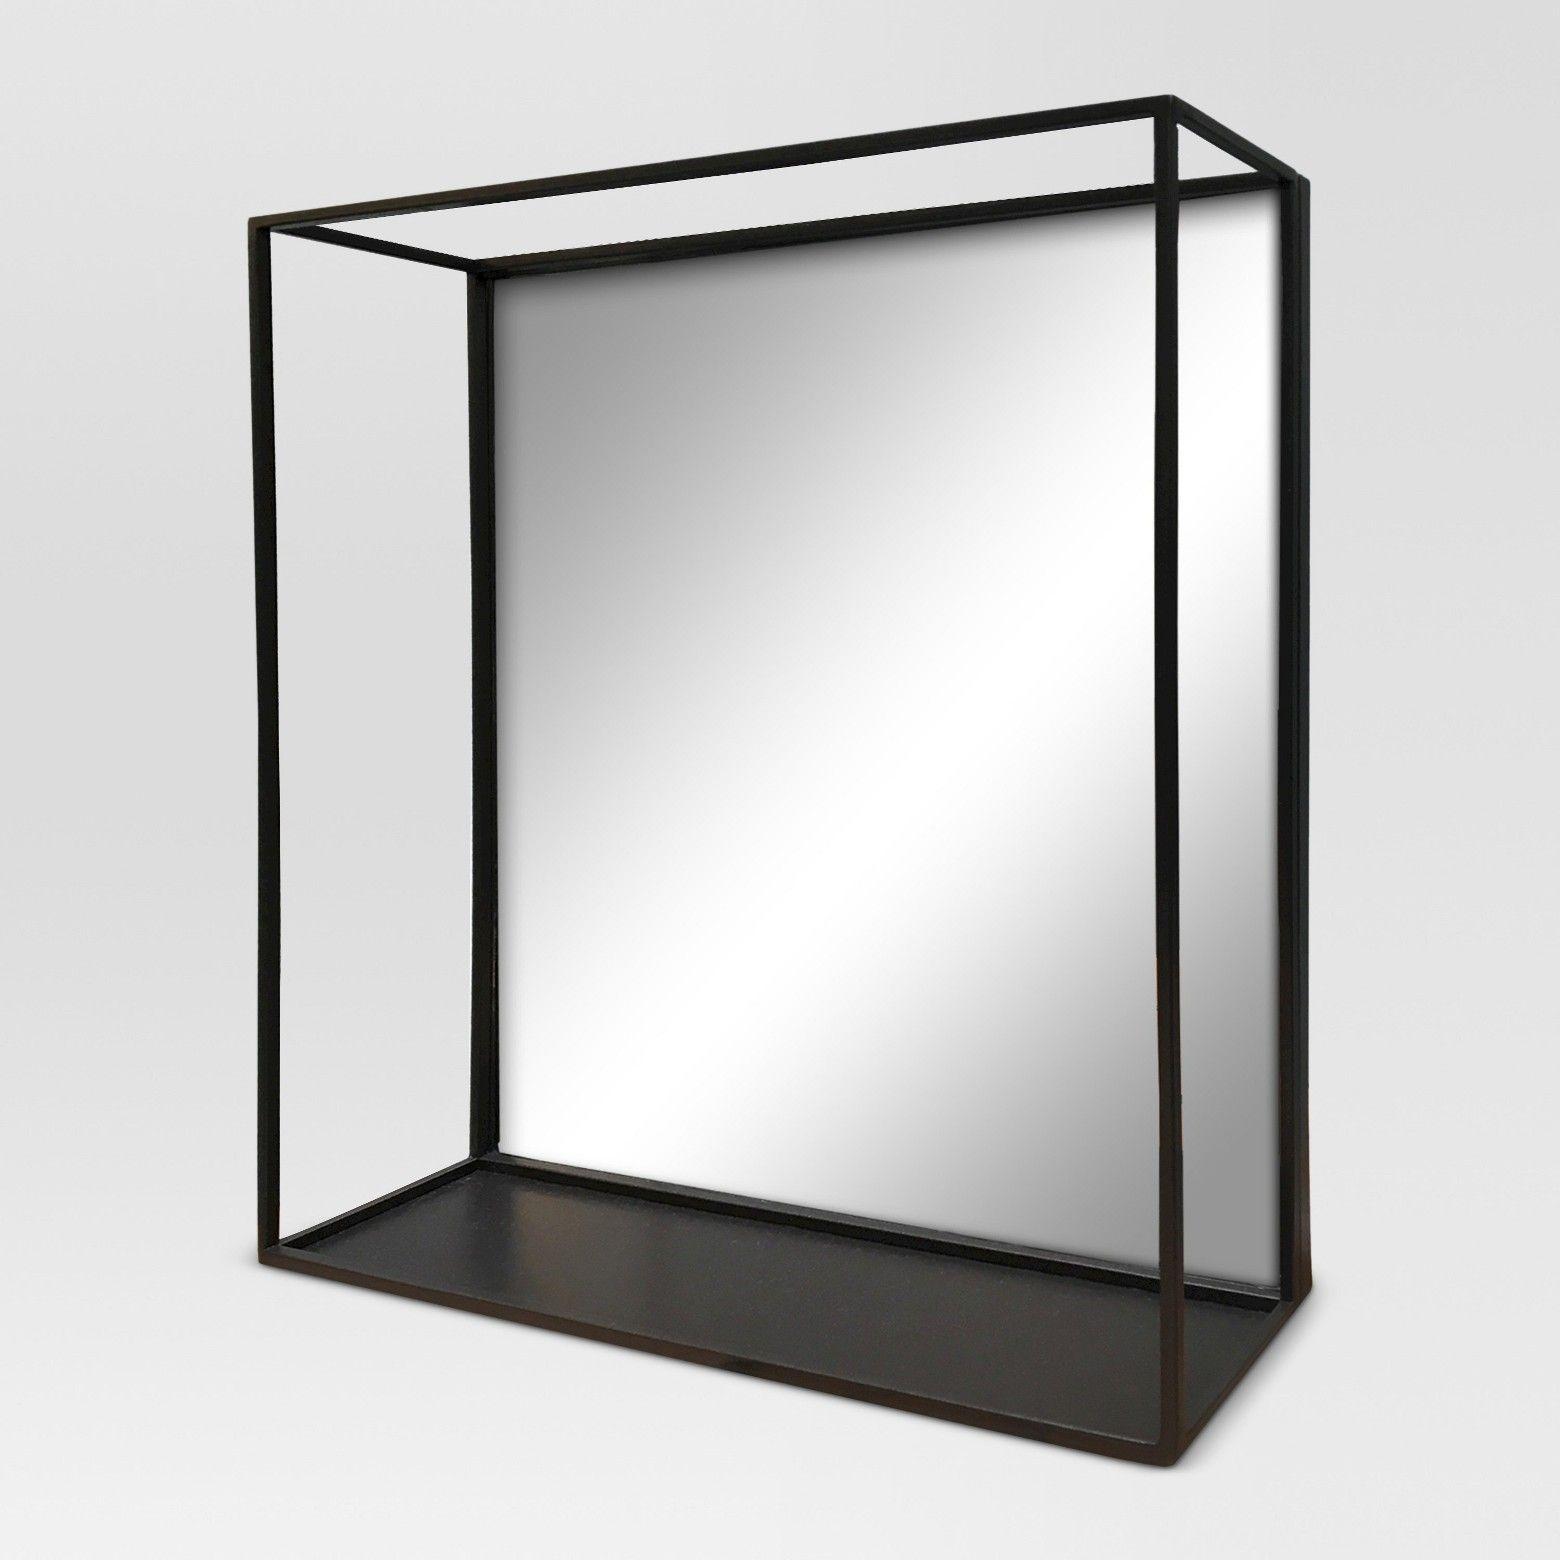 project  square metal decorative wall mirror with shelf black. project  square metal decorative wall mirror with shelf black